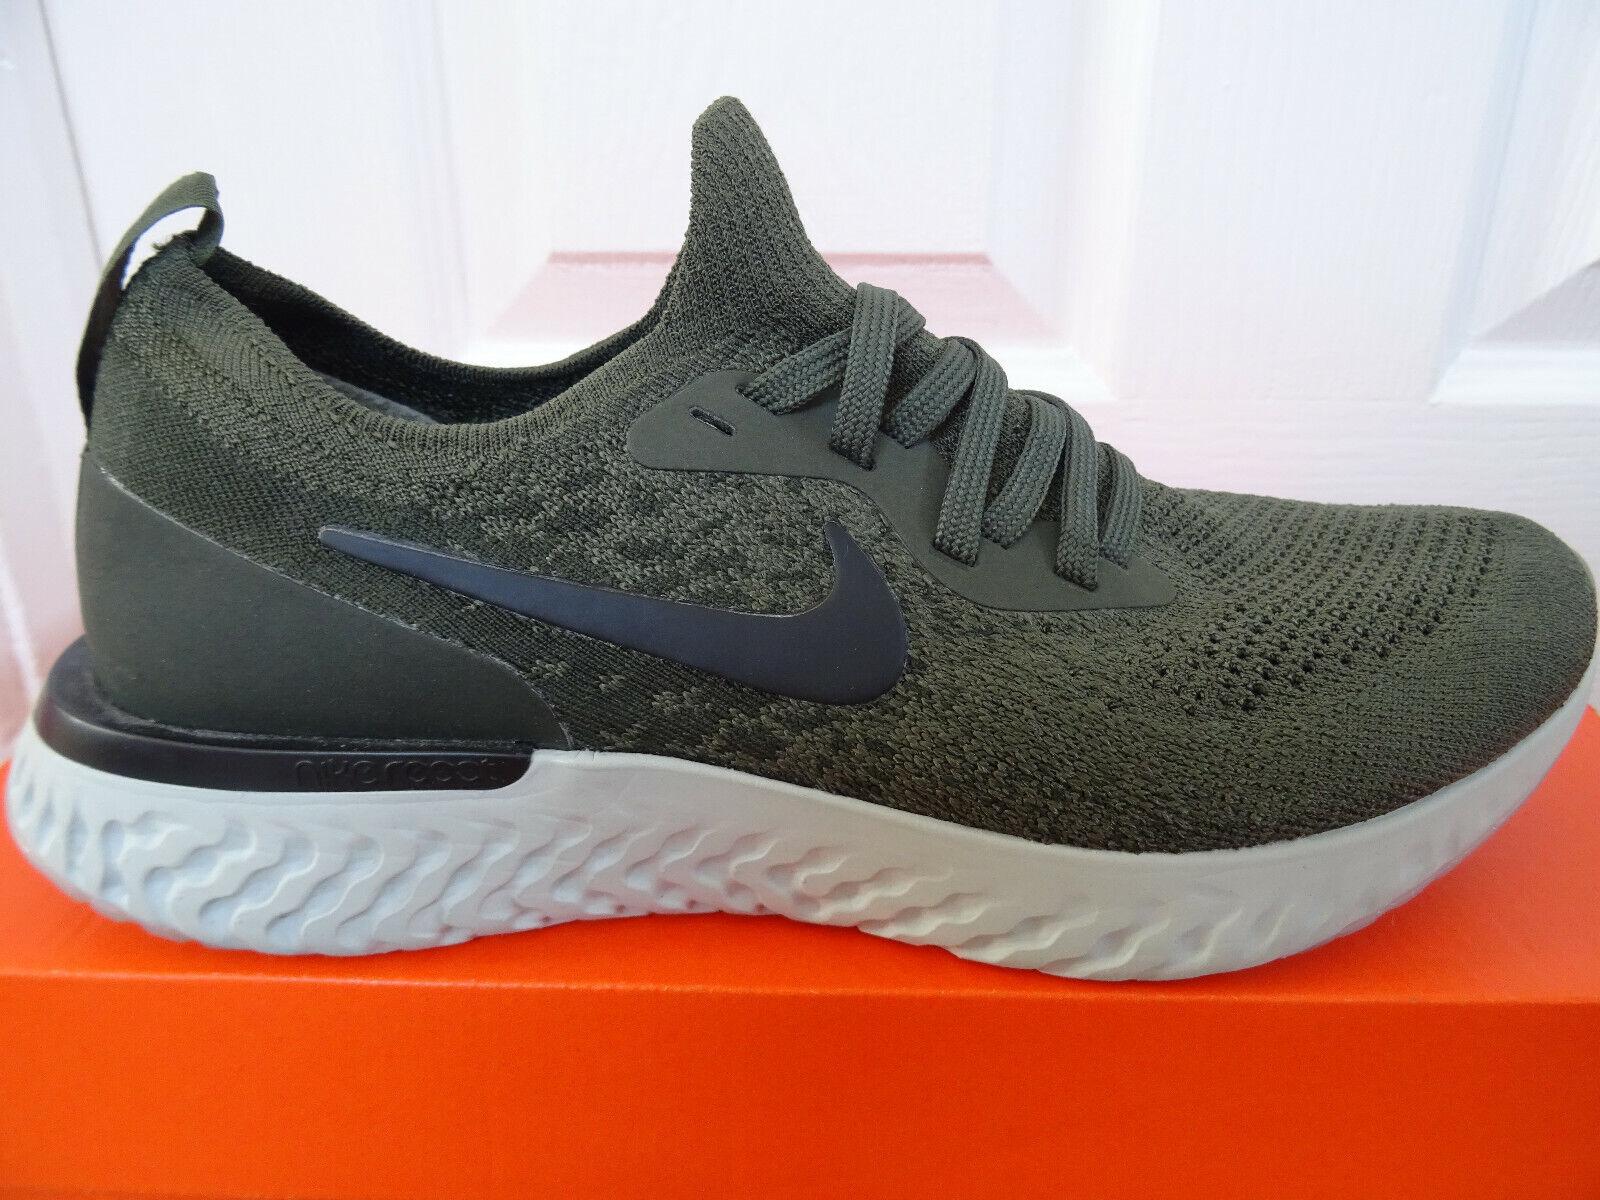 Nike Epic React Flyknit womens trainers AQ0070 300 uk 6.5 eu 40.5 us 9 NEW+BOX